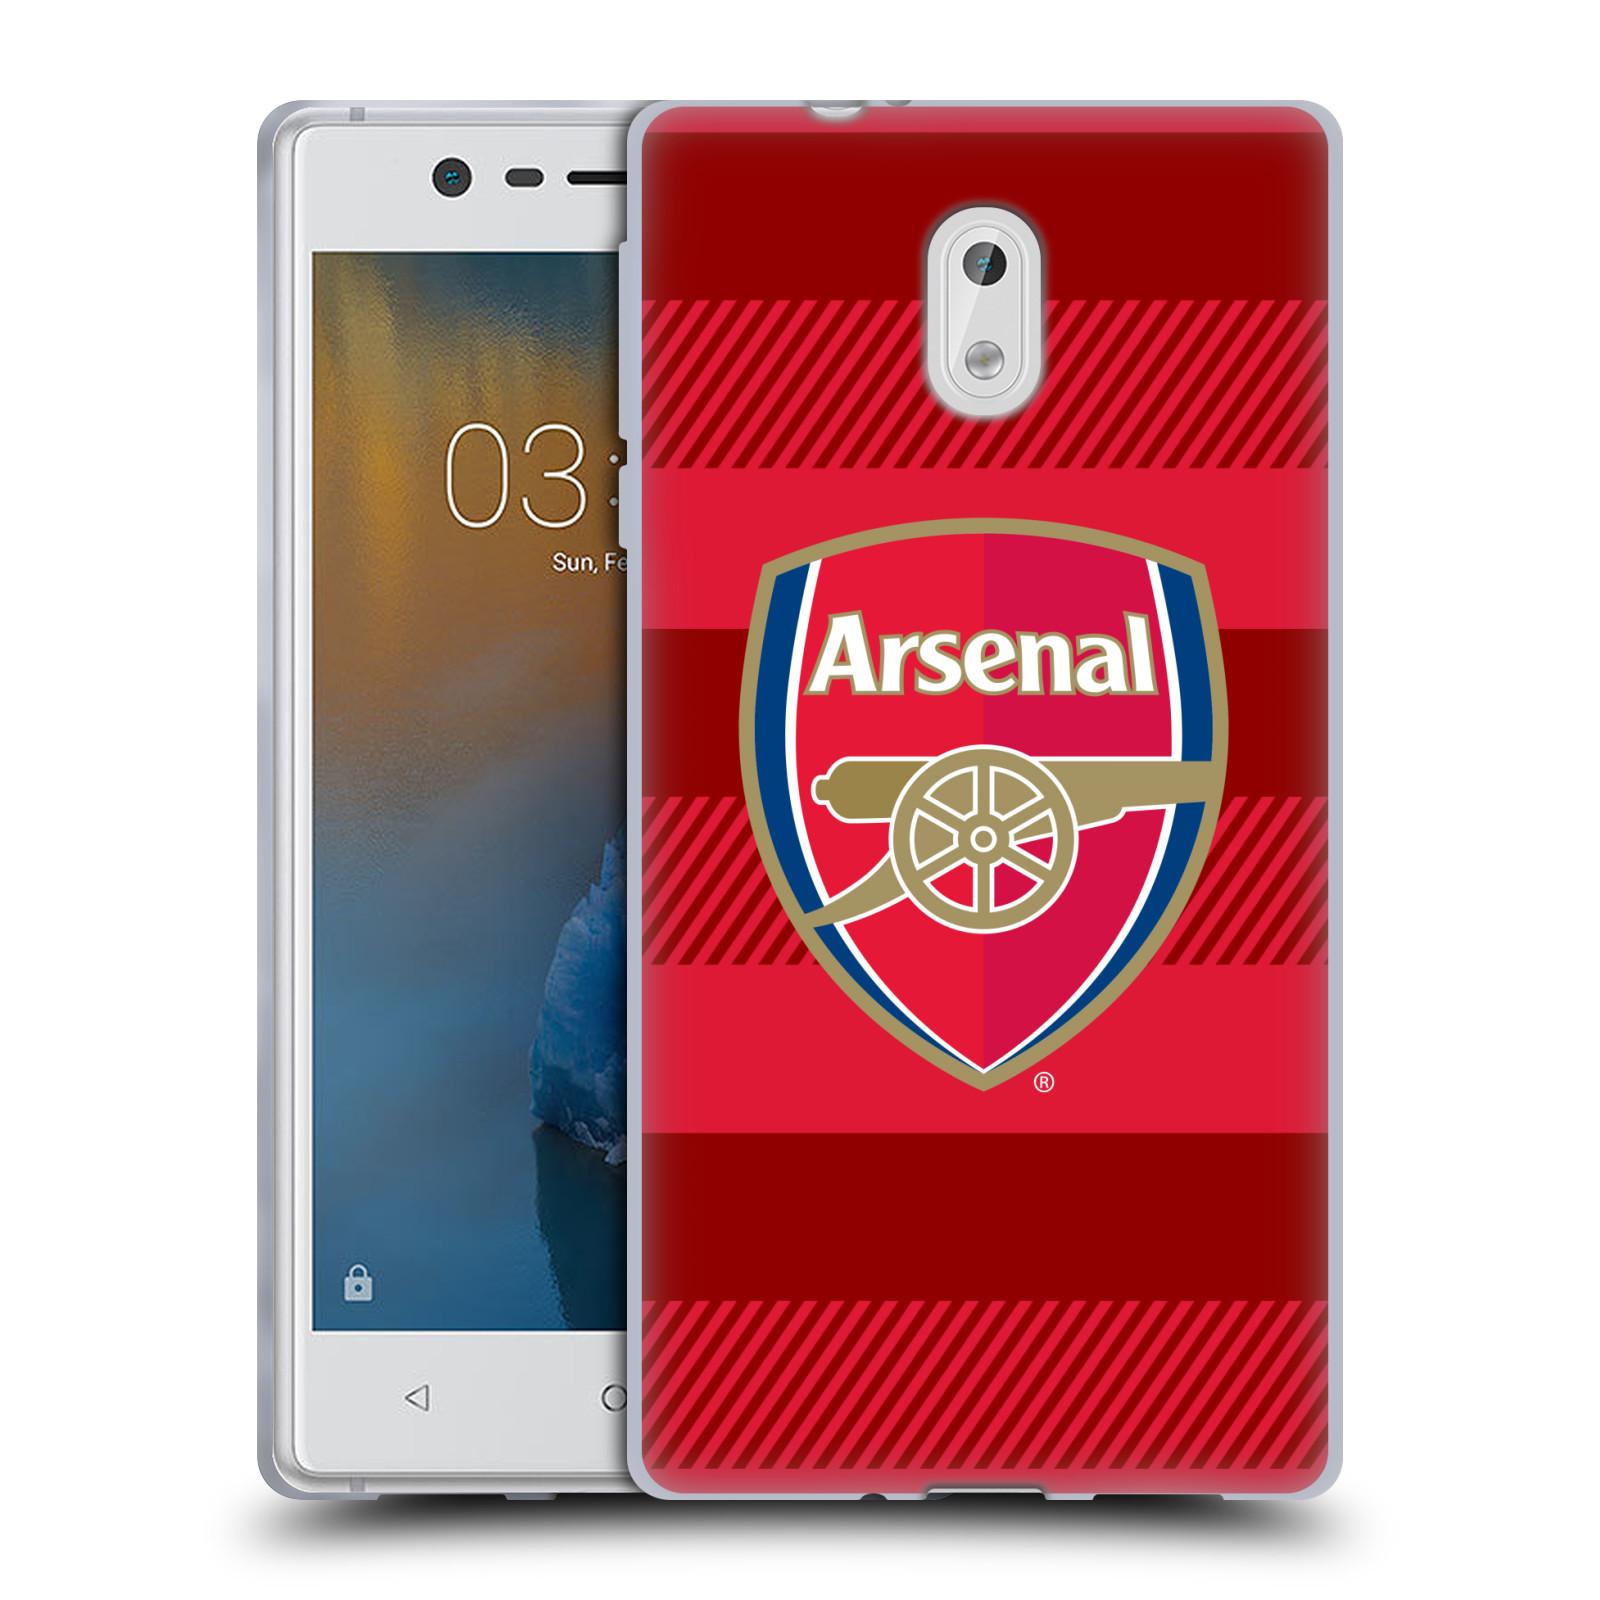 Silikonové pouzdro na mobil Nokia 3 Head Case - Arsenal FC - Logo s pruhy